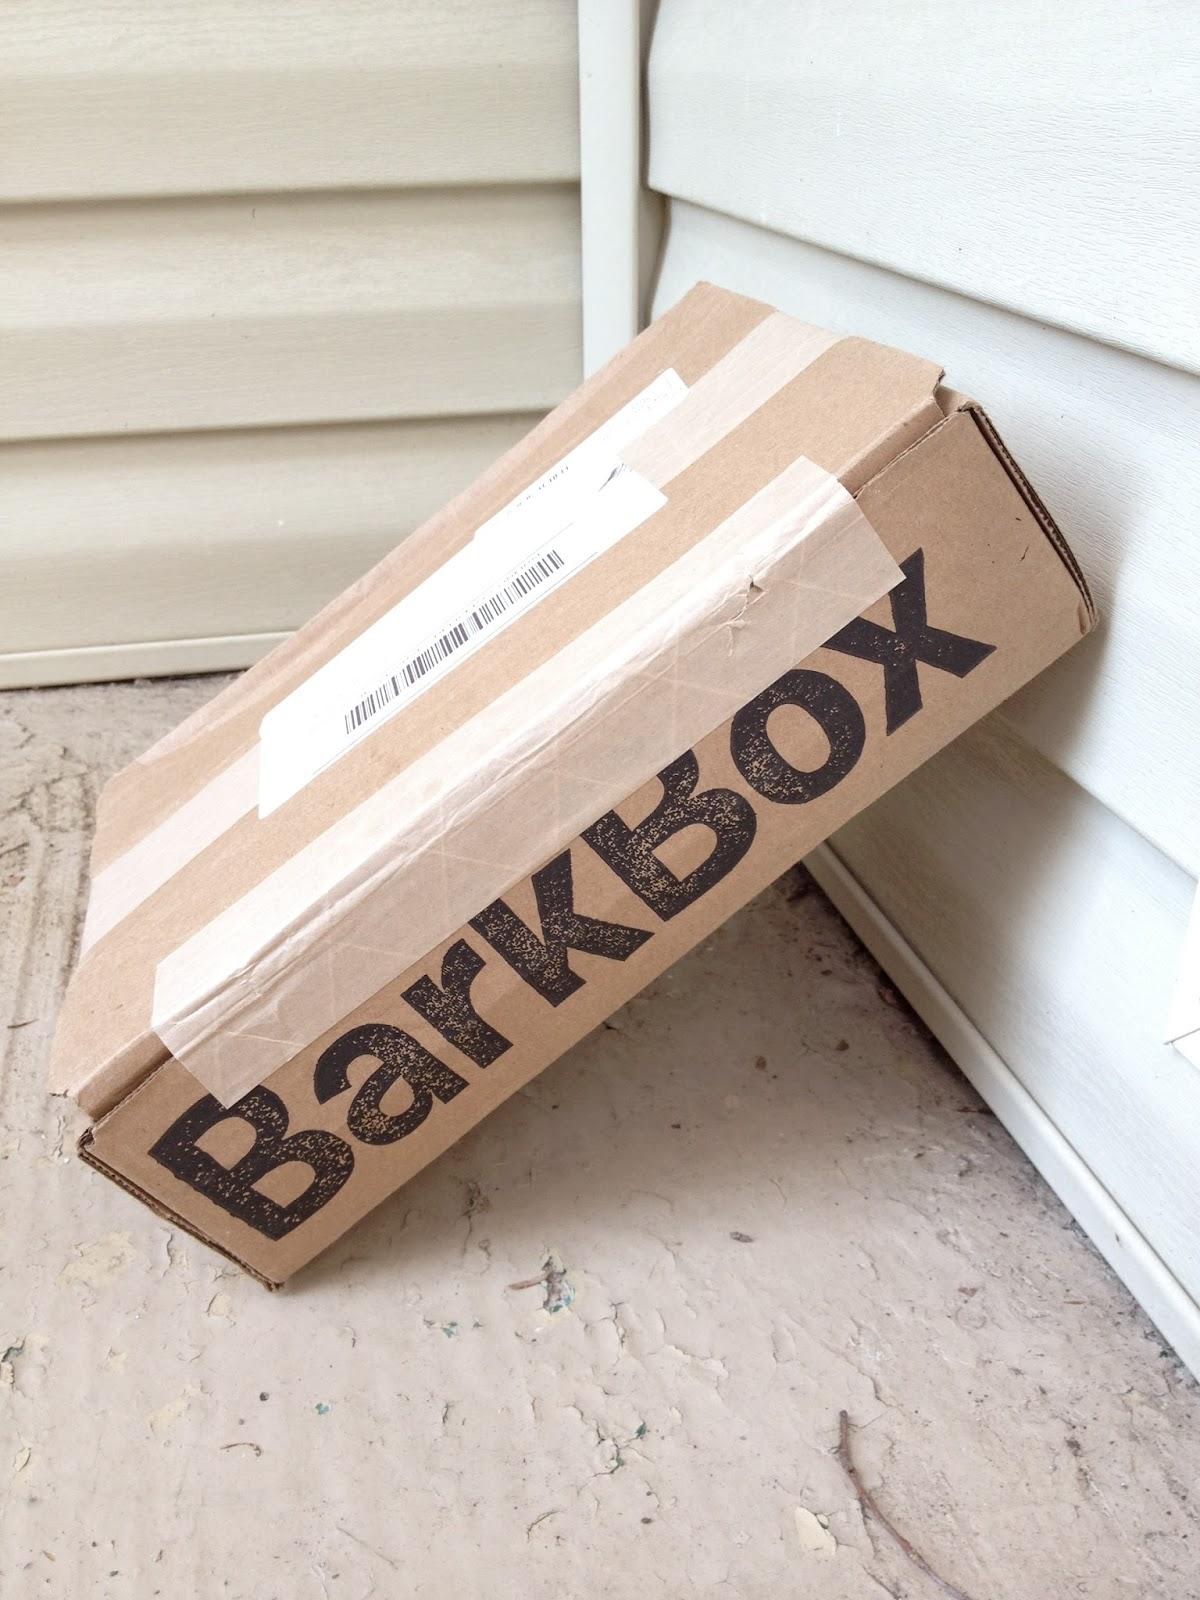 BarkBox: Mailman + Dog = Friends